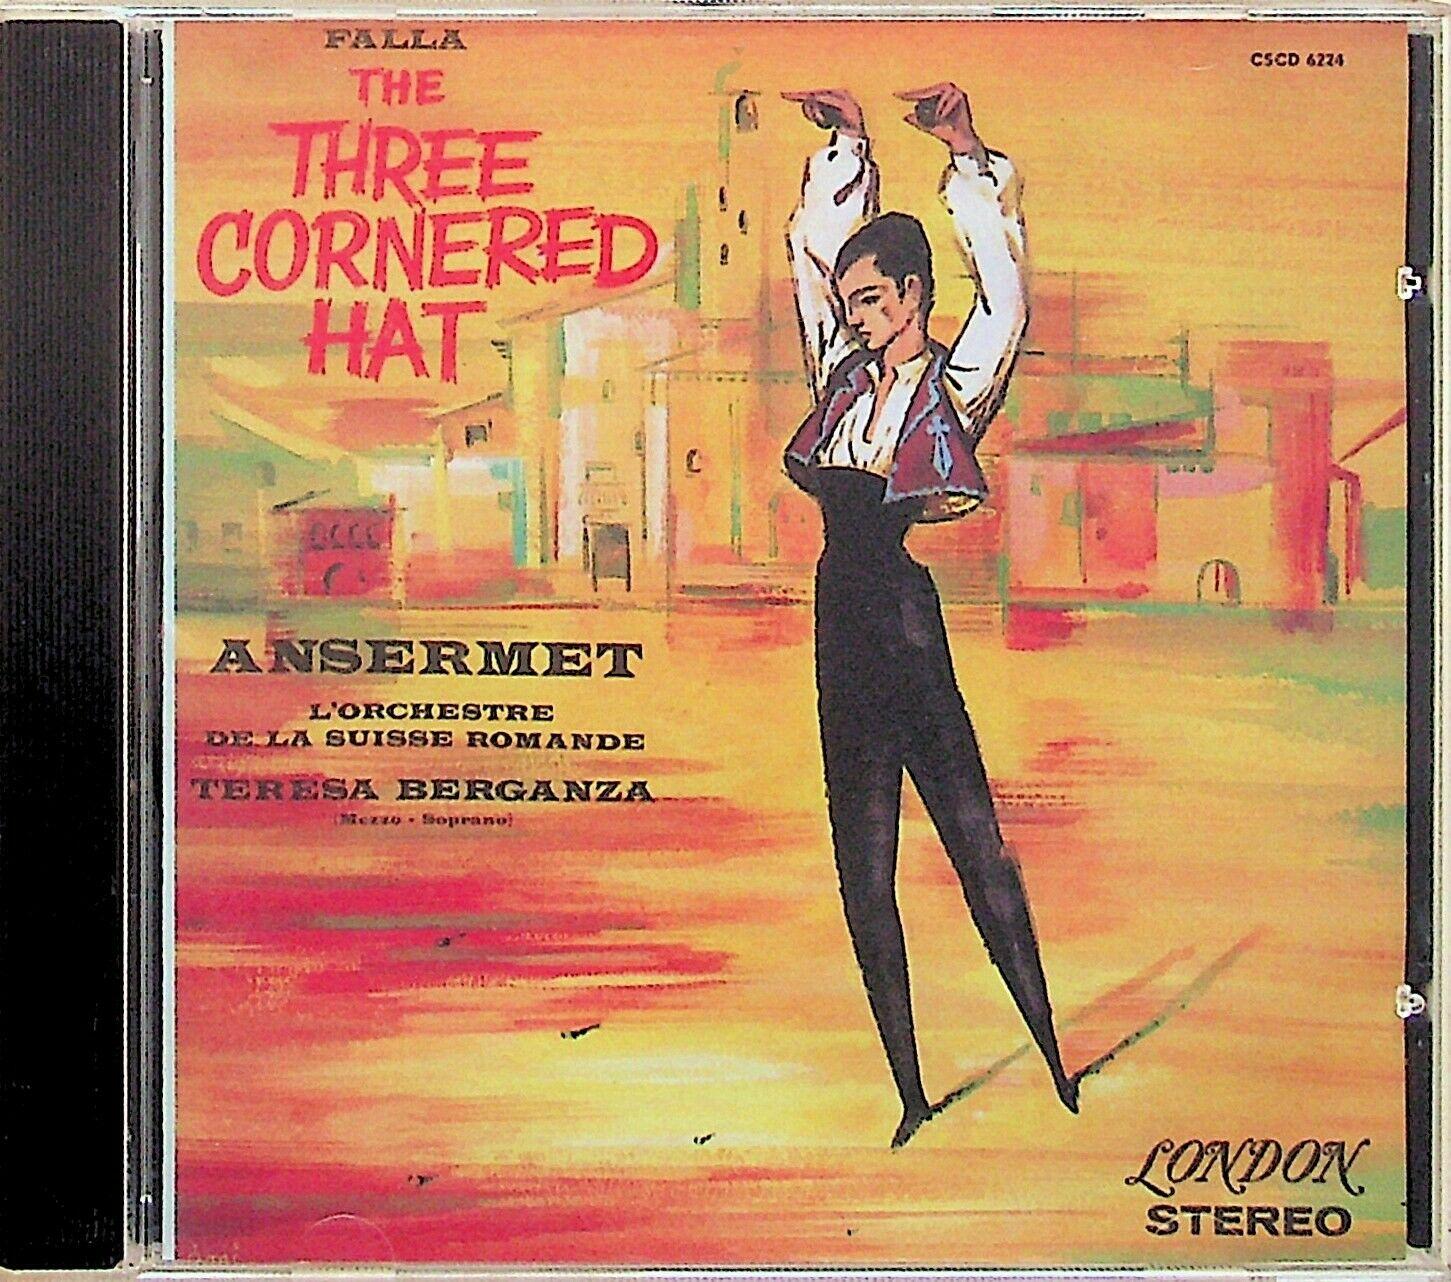 FALLA The Three Cornered Hat ANSERMET Berganza RARE 24K Audiophile GOLD DISC CD